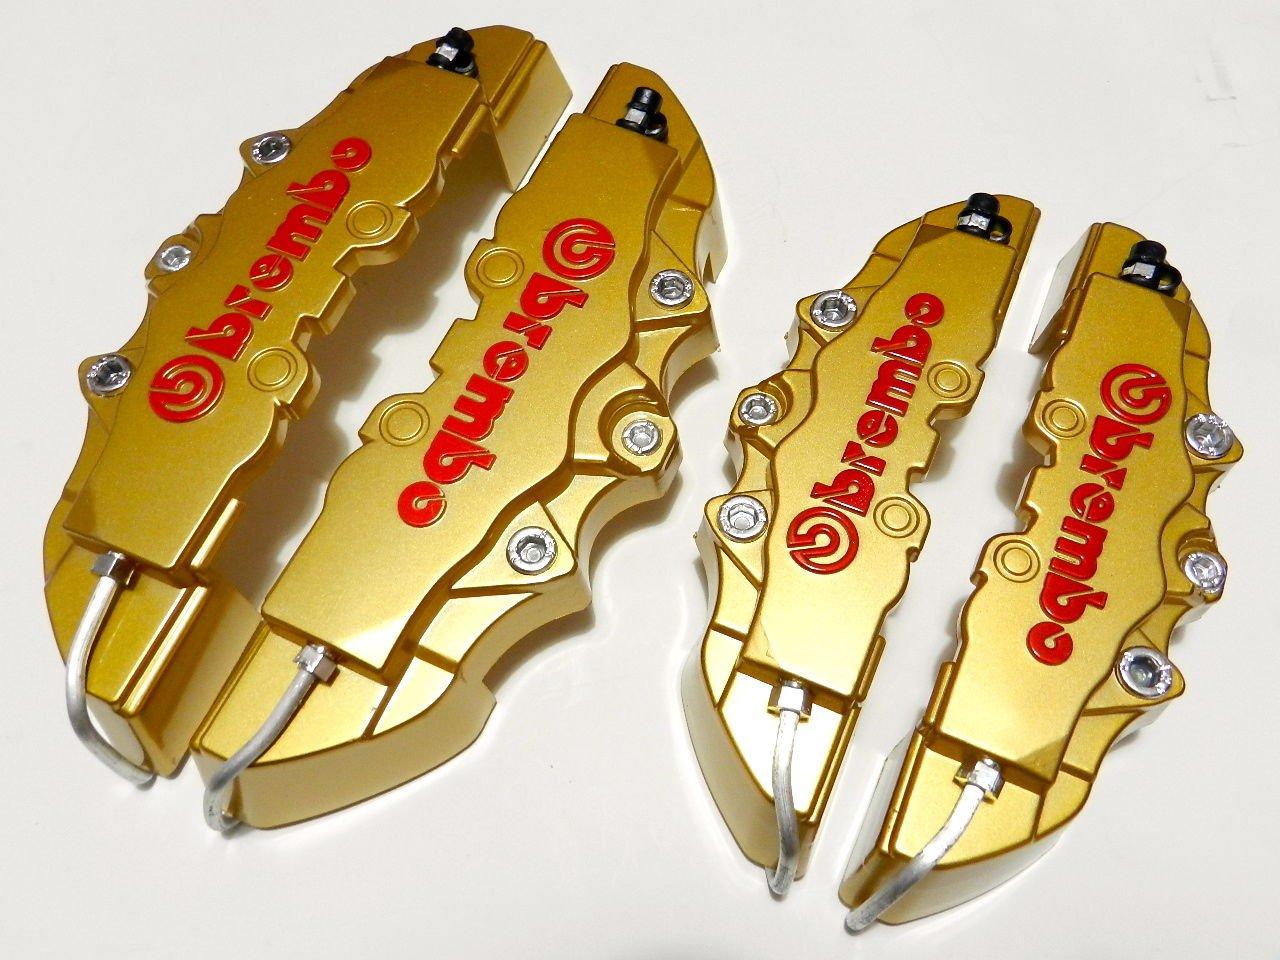 GOLD 4PC F+R UNIVERSAL 3D ABS PLASTIC DISC BRAKE CALIPER COVERS